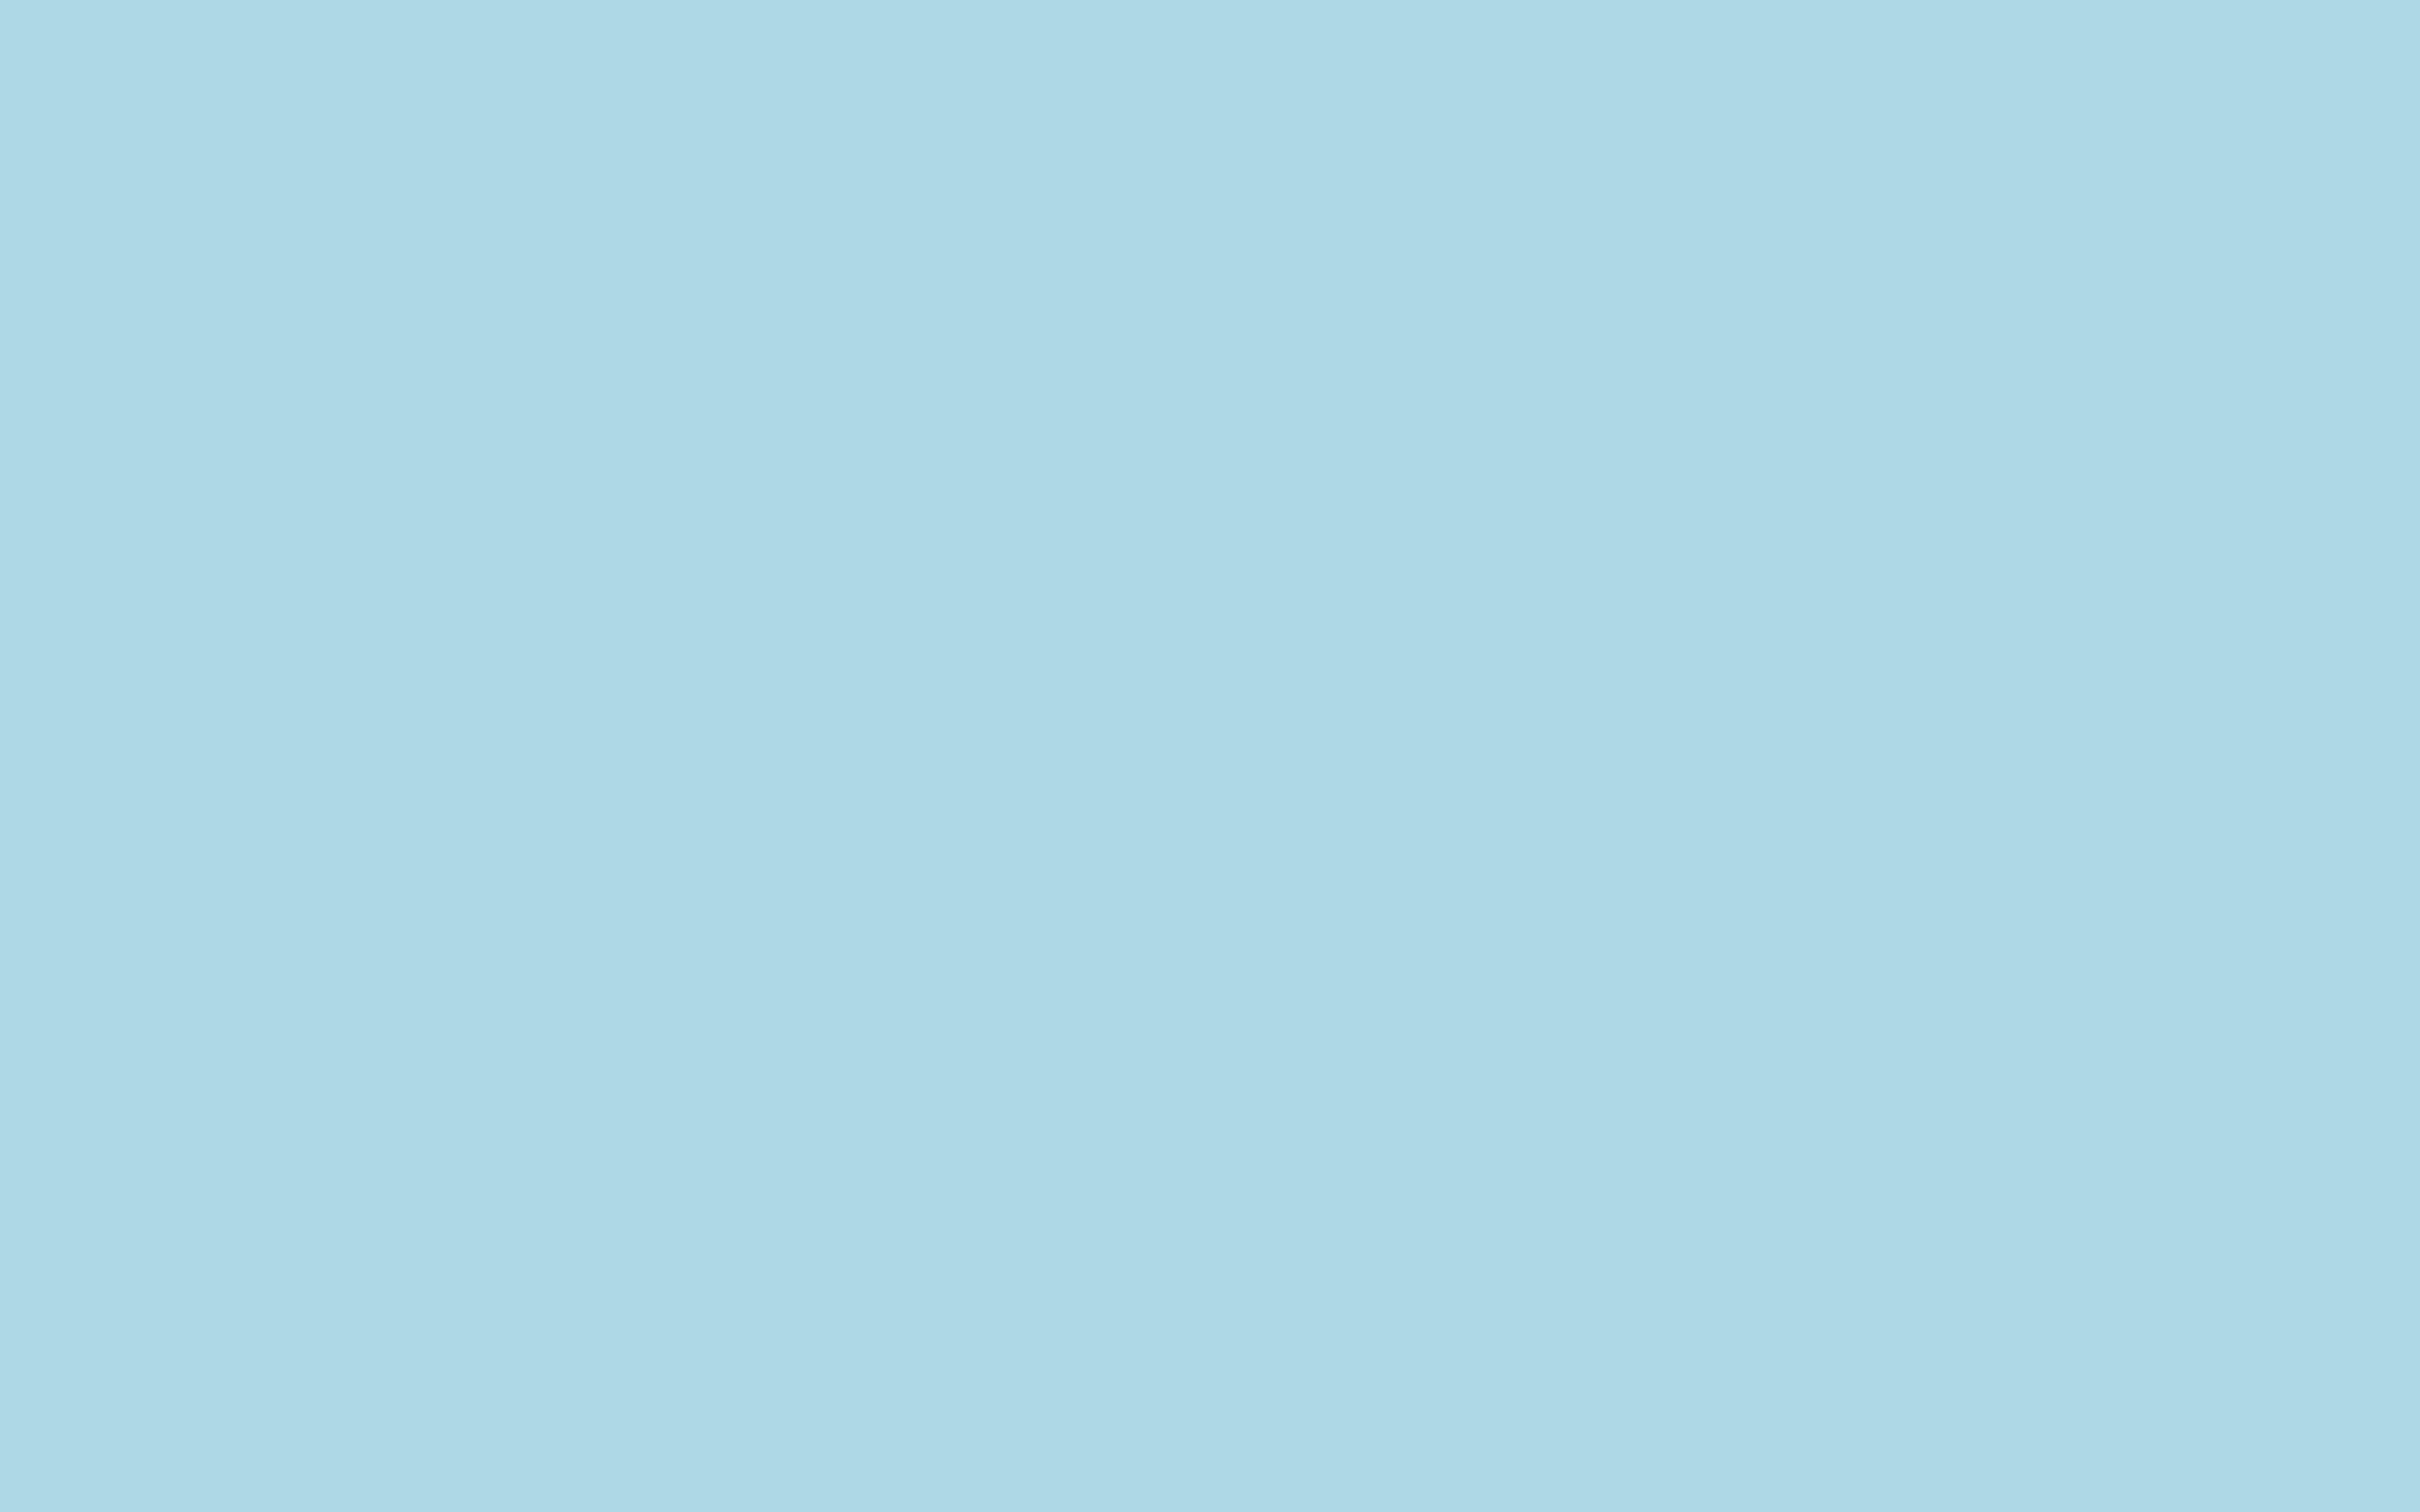 Solid Light Blue